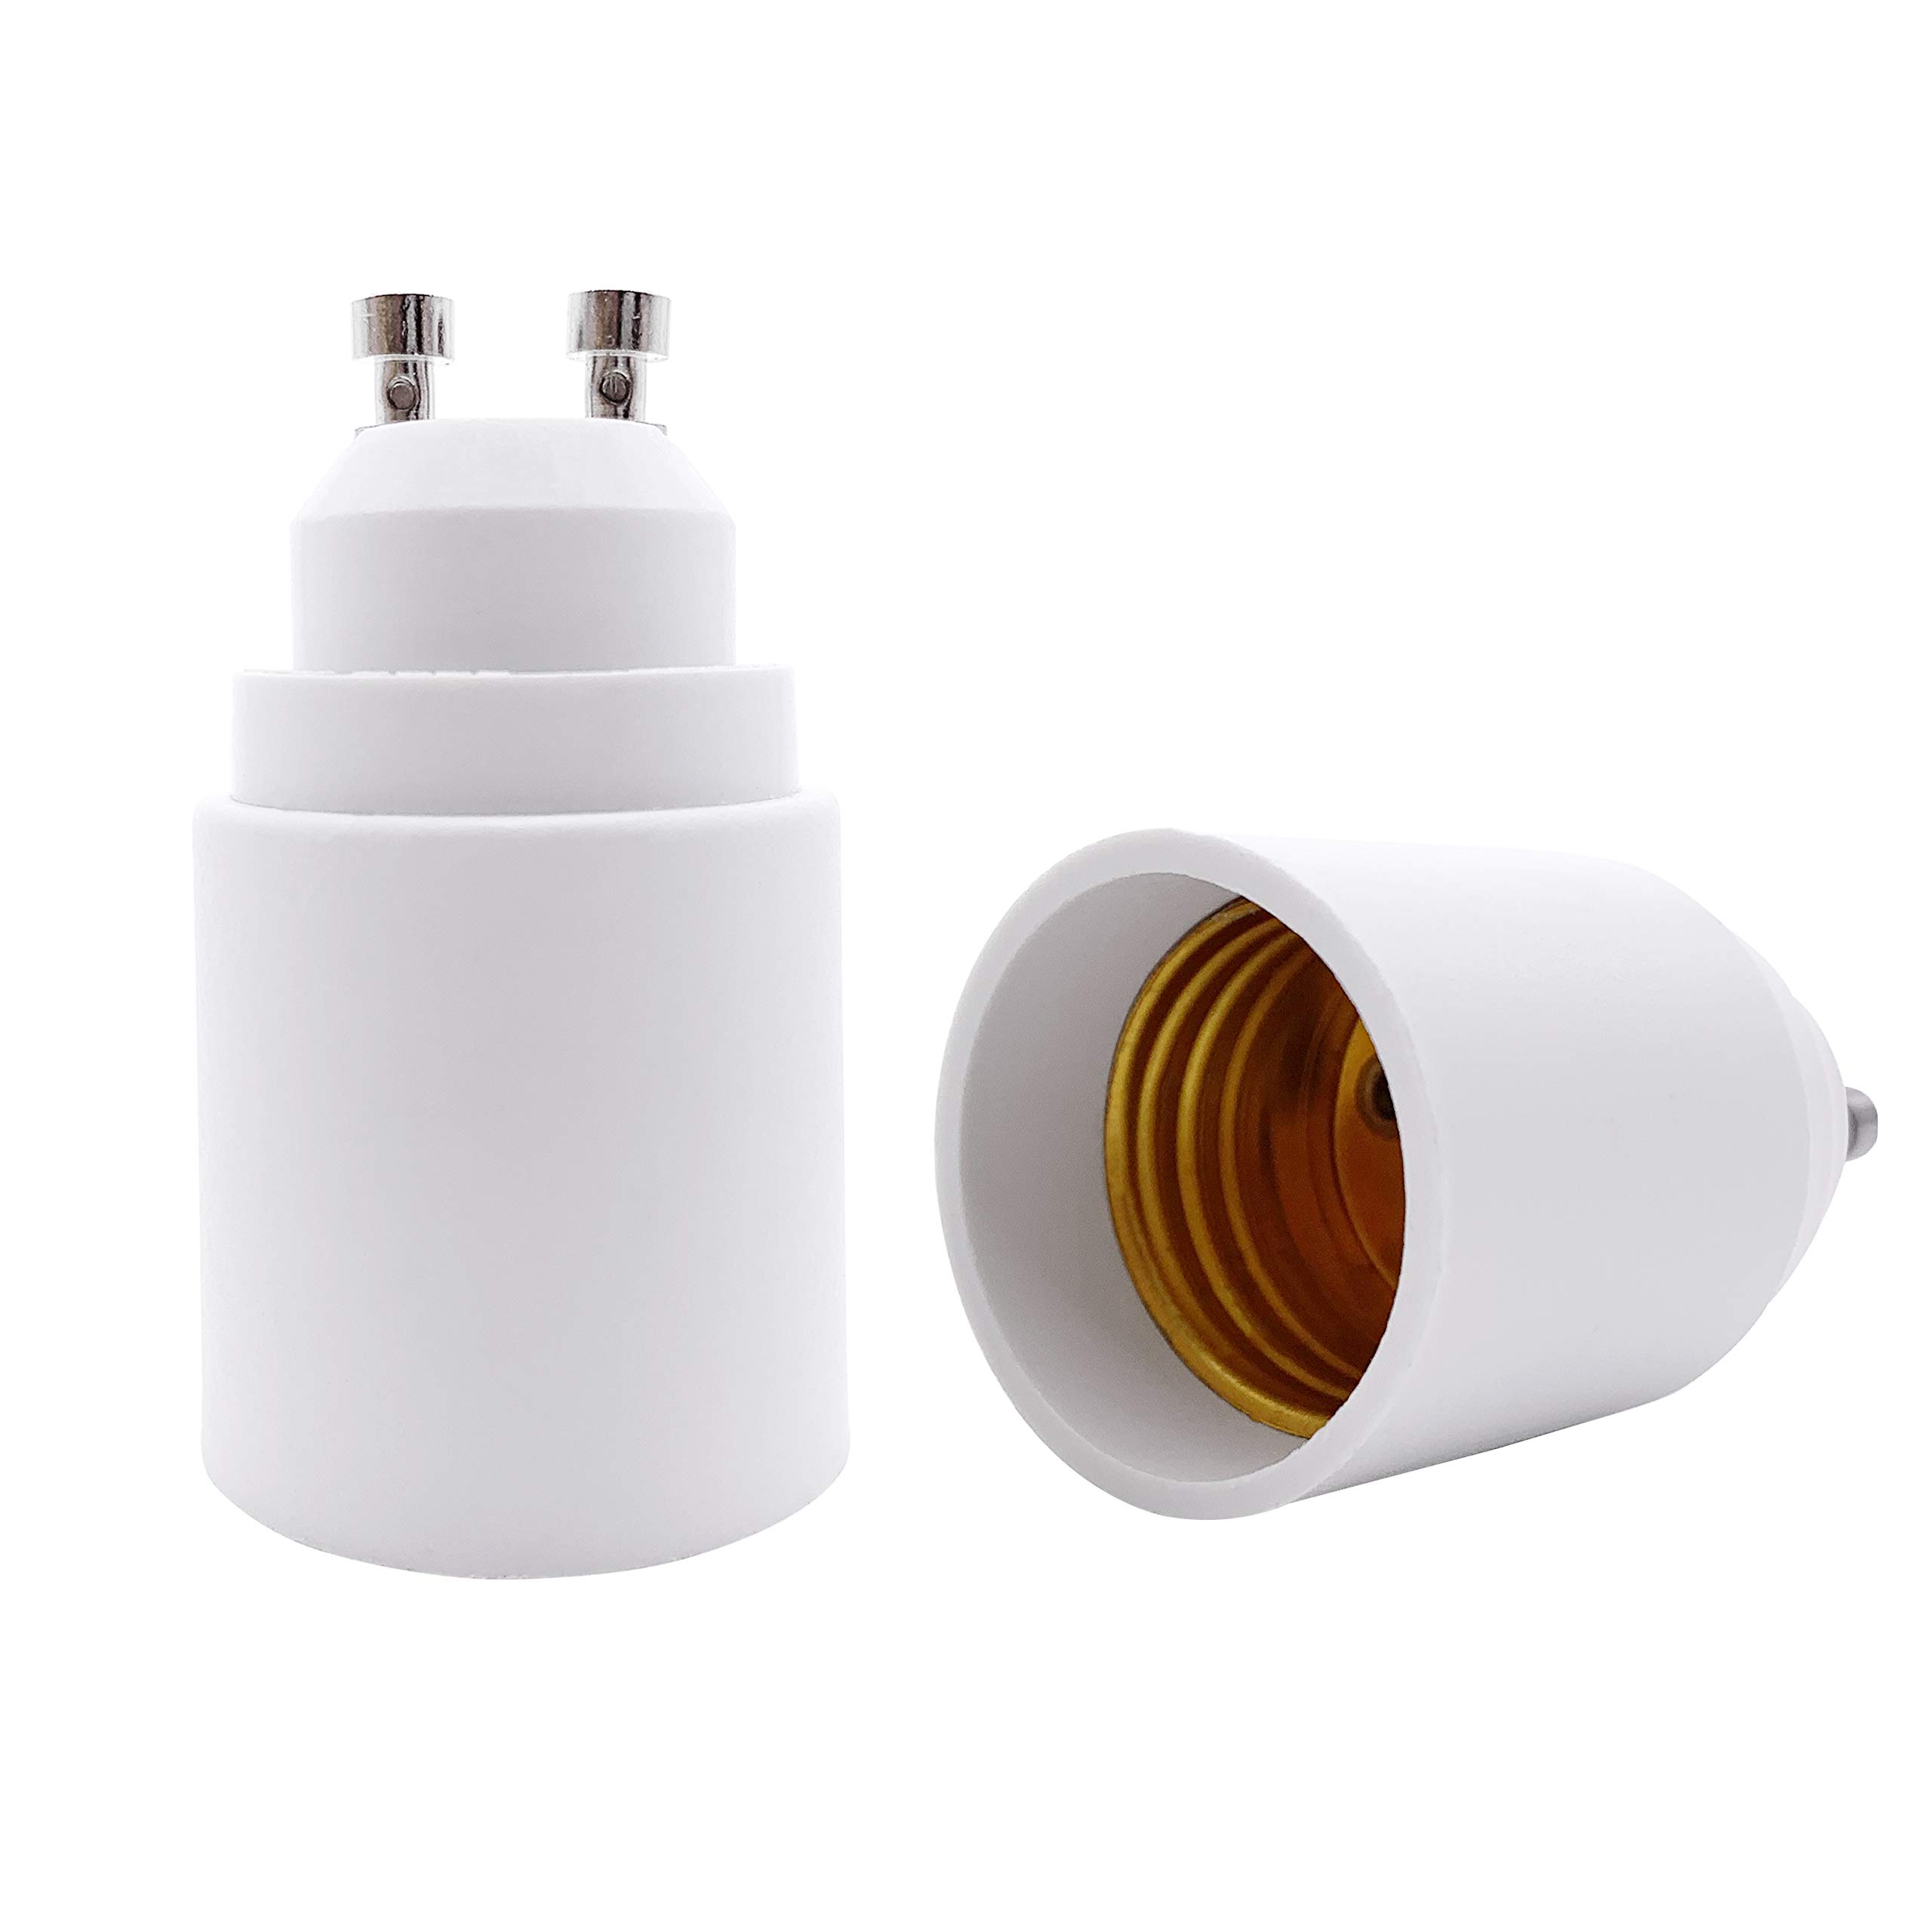 YAYZA! 2-Pack GU10 to E26 E27 Bulb Base Adapter, GU10 Bi-Pin Connector to Medium Edison Screw Light Socket Converter, Heat Resistant Up to 200℃ No Fire Hazard